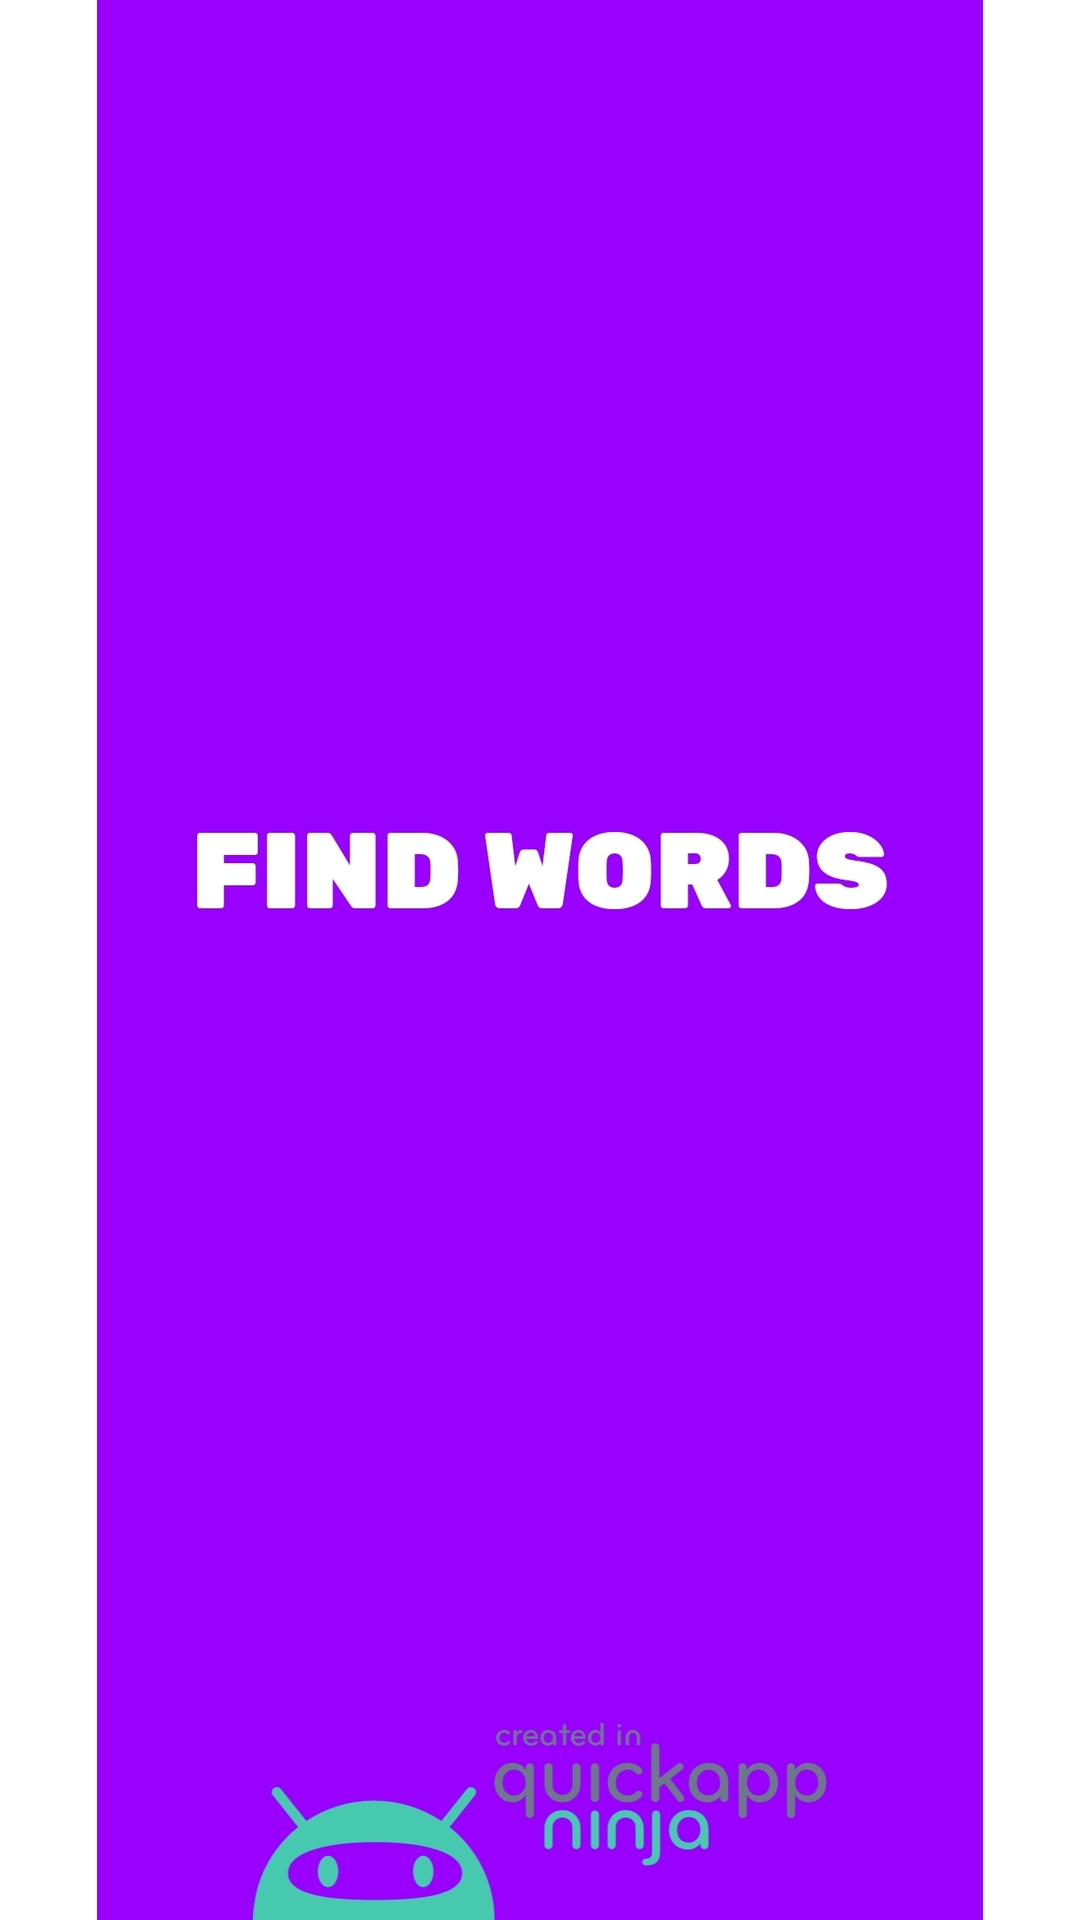 Find words: Amazon.es: Appstore para Android